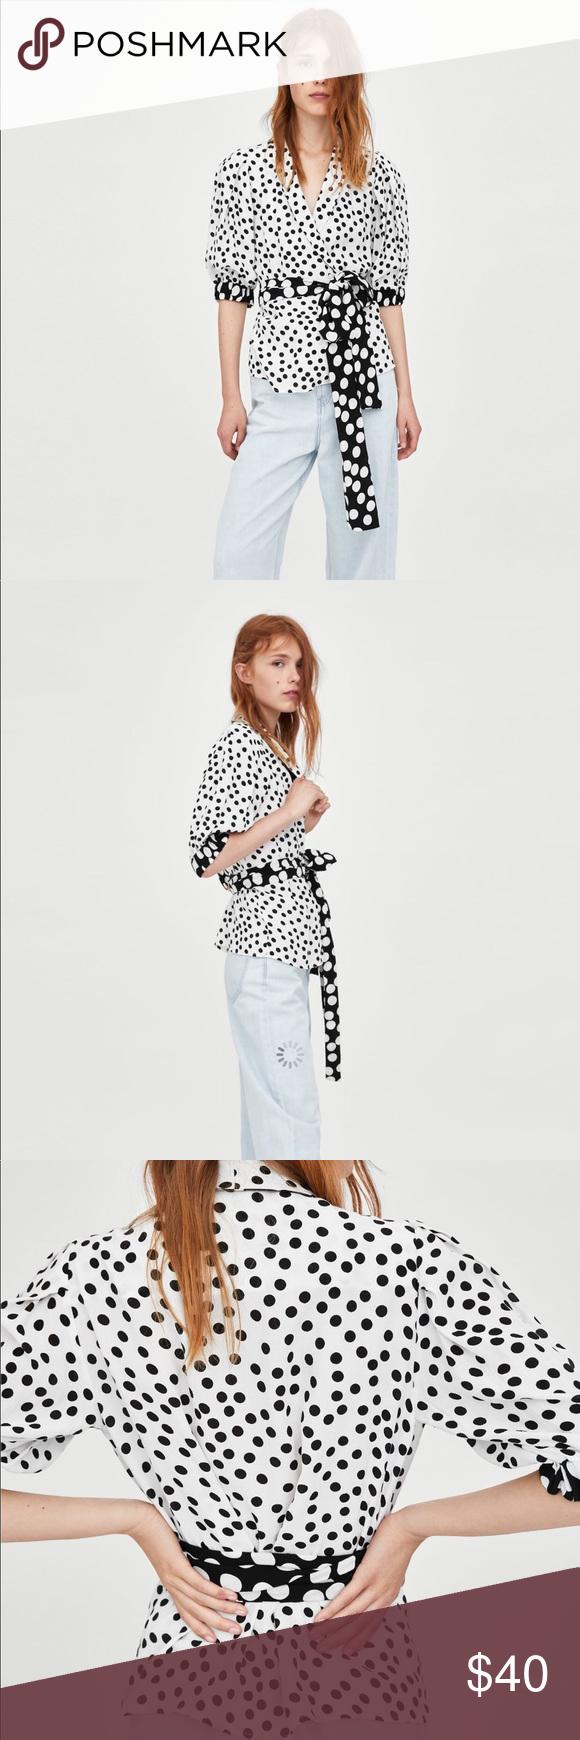 f2d3e475 NWT Zara polka dot blouse NWT Zara polka Dot Wrap top. Size S. Zara Tops  Blouses